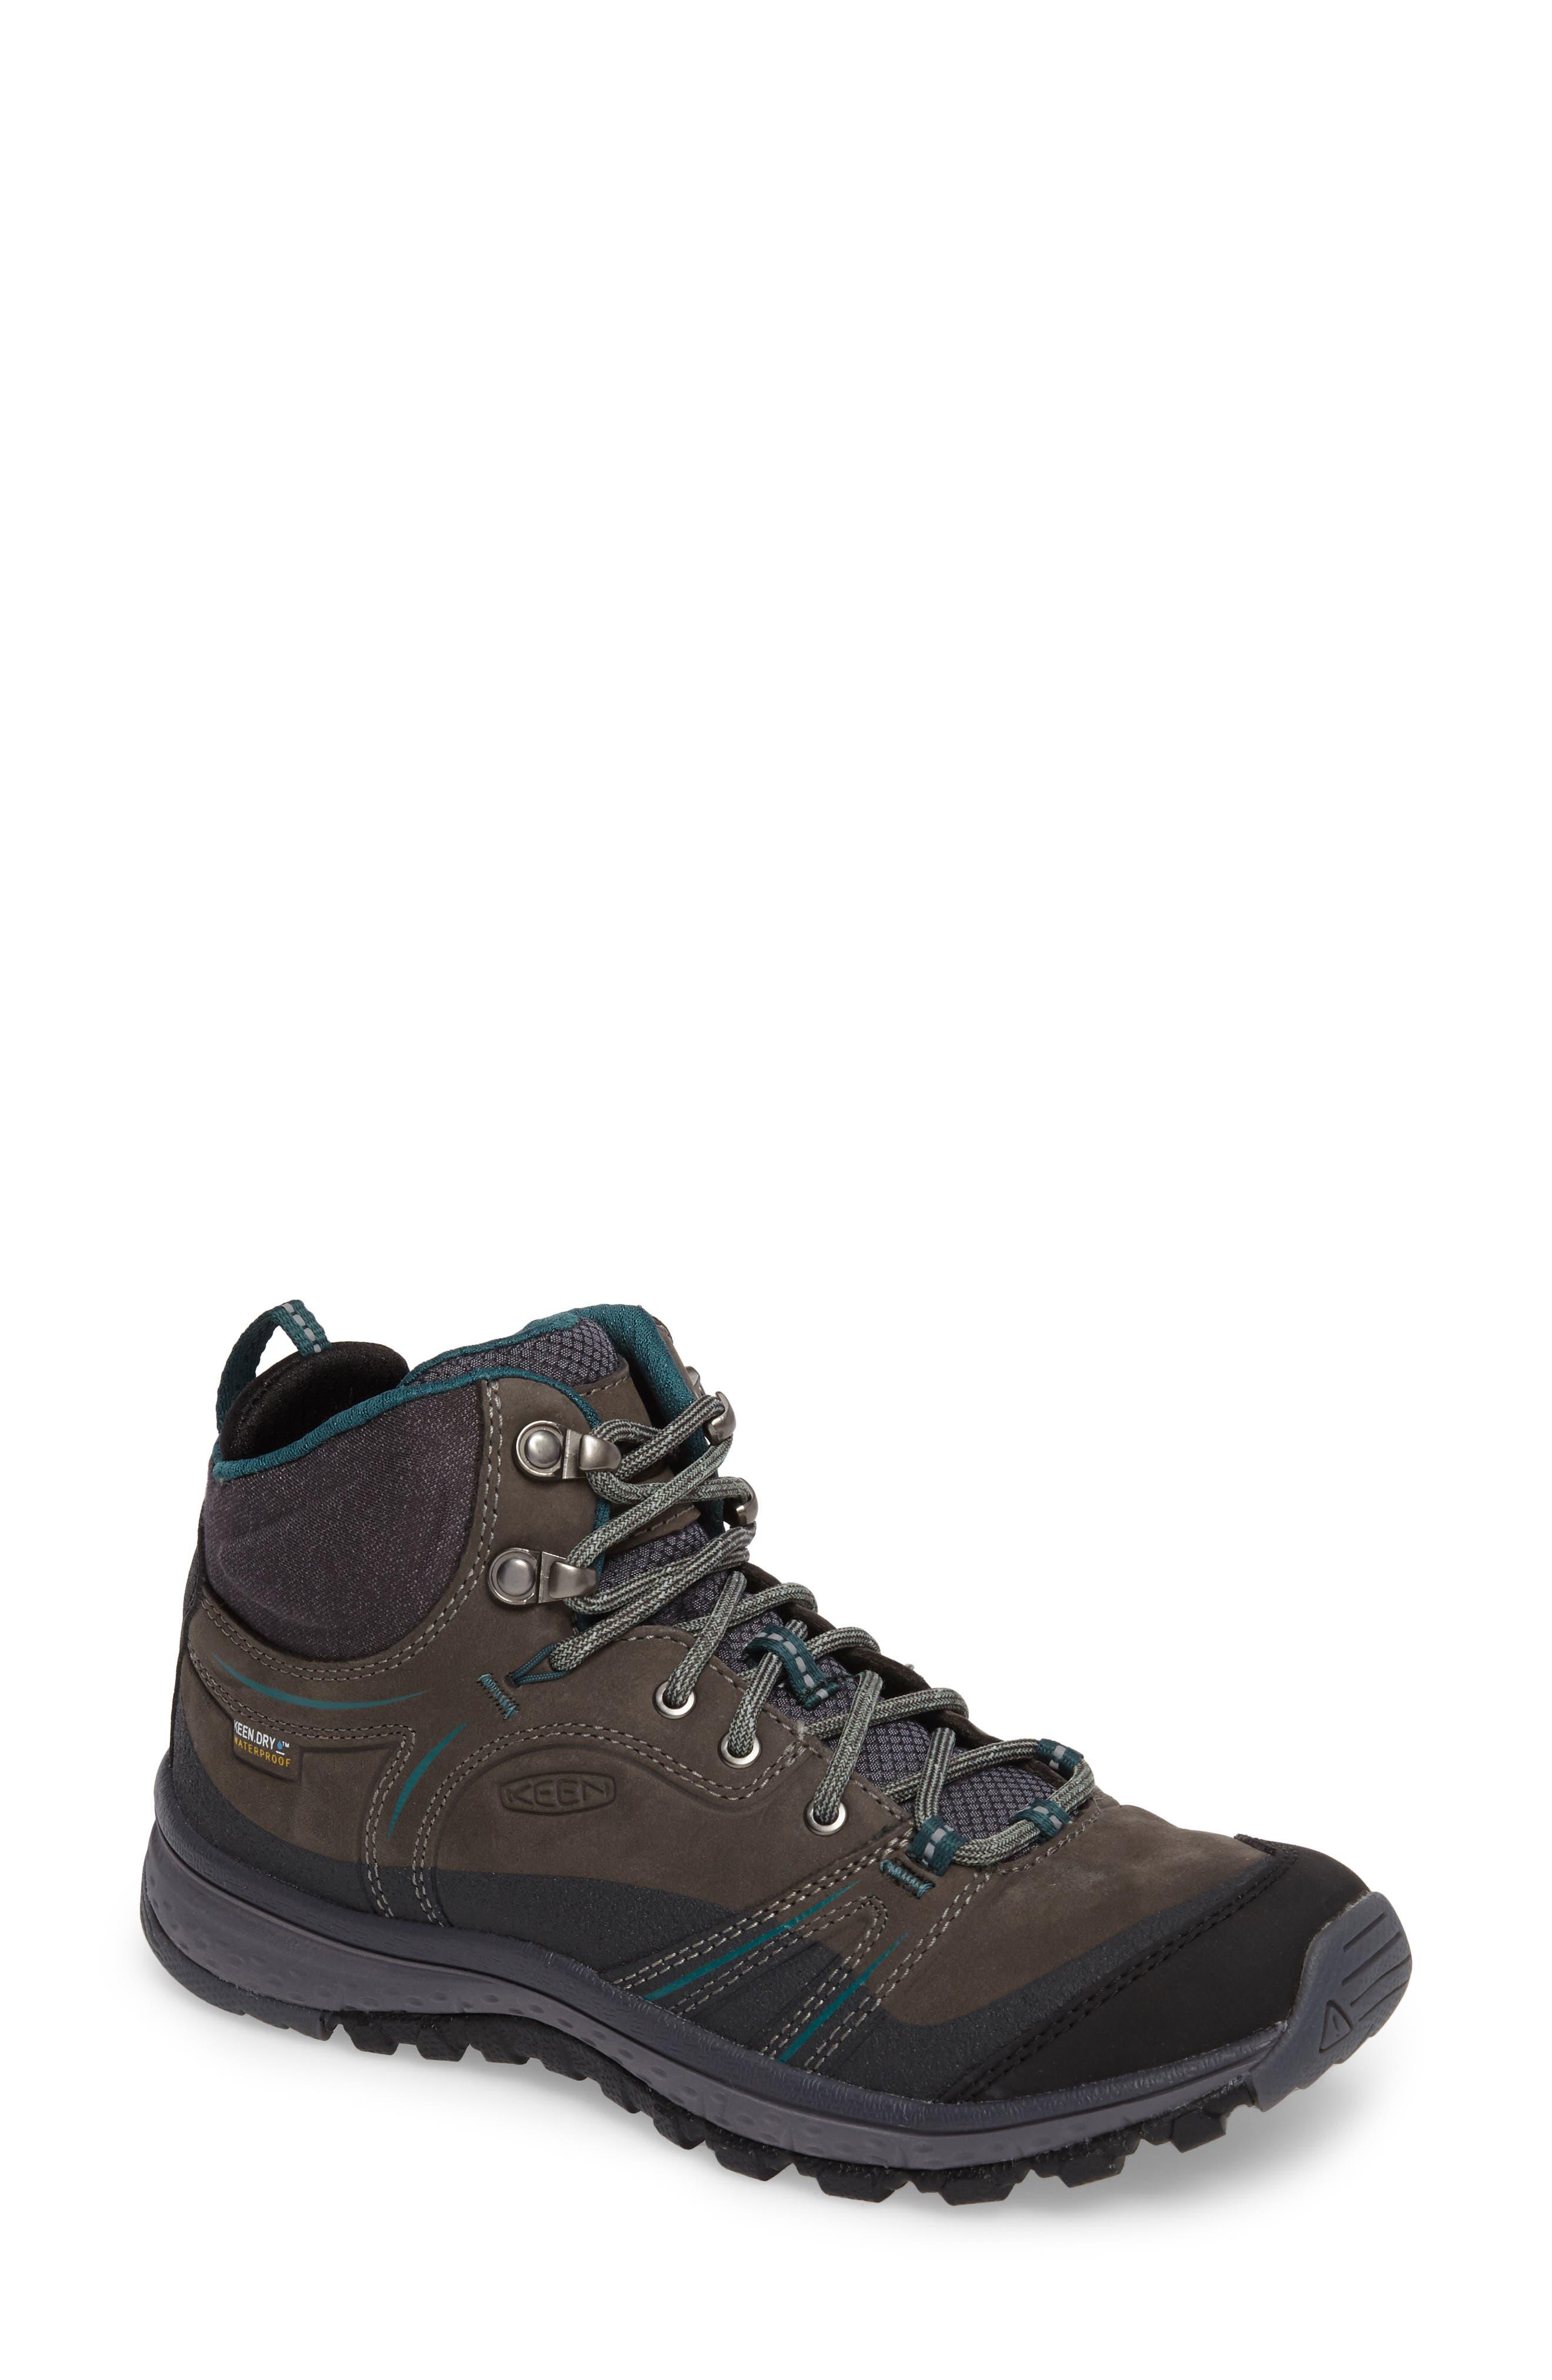 Terradora Leather Waterproof Hiking Boot,                             Main thumbnail 1, color,                             MUSHROOM NUBUCK LEATHER